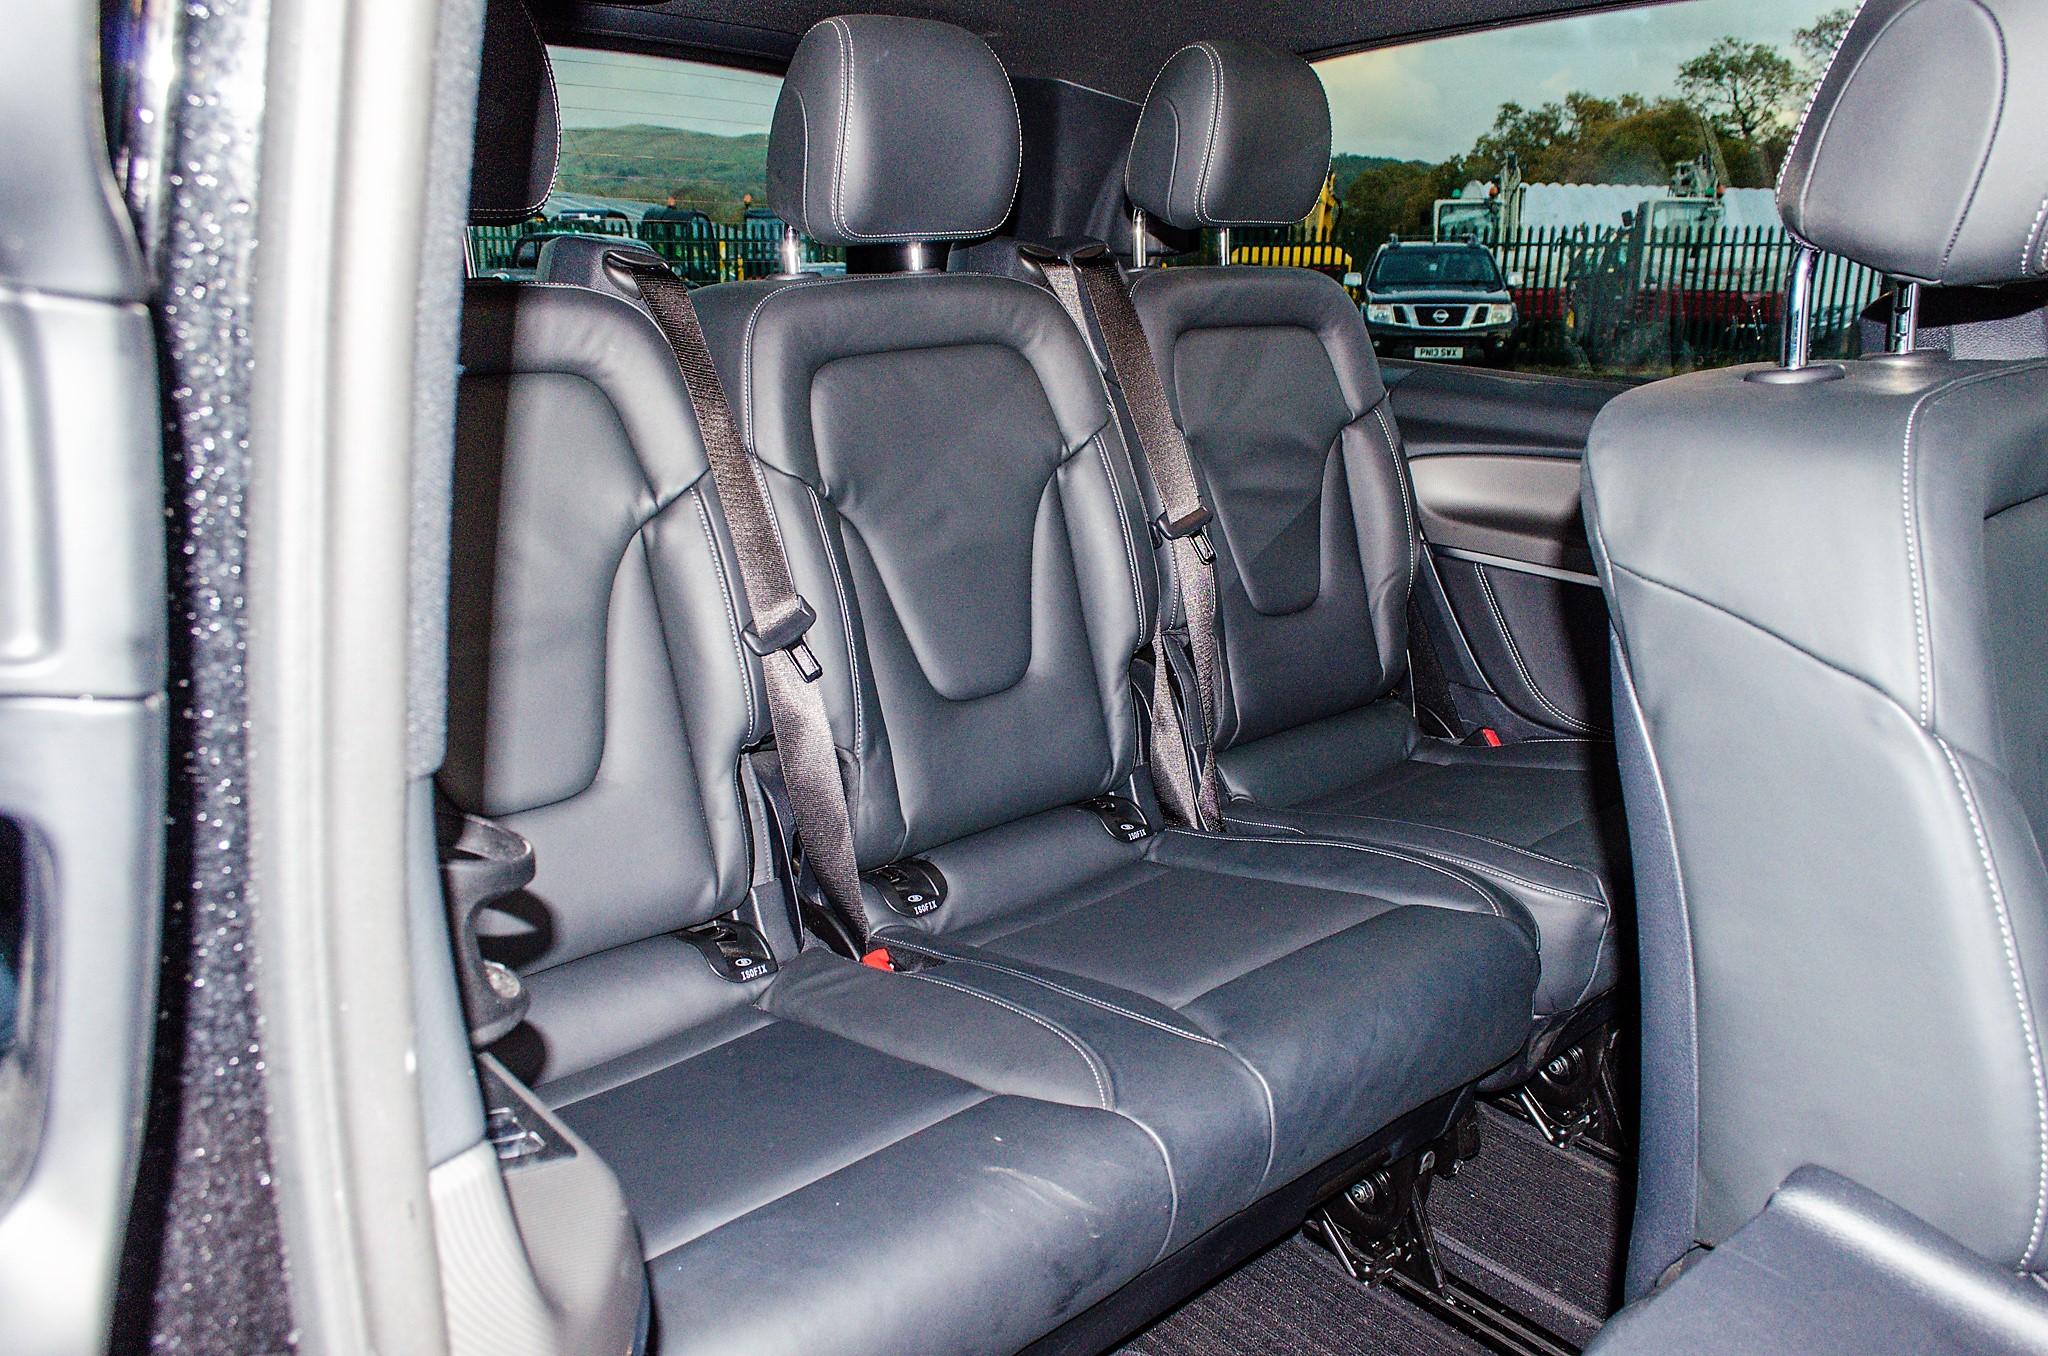 Mercedes Benz V250 Sport Bluetec XLWB auto diesel 8 seat MPV Reg No: FY68 JTO Date of First - Image 21 of 27